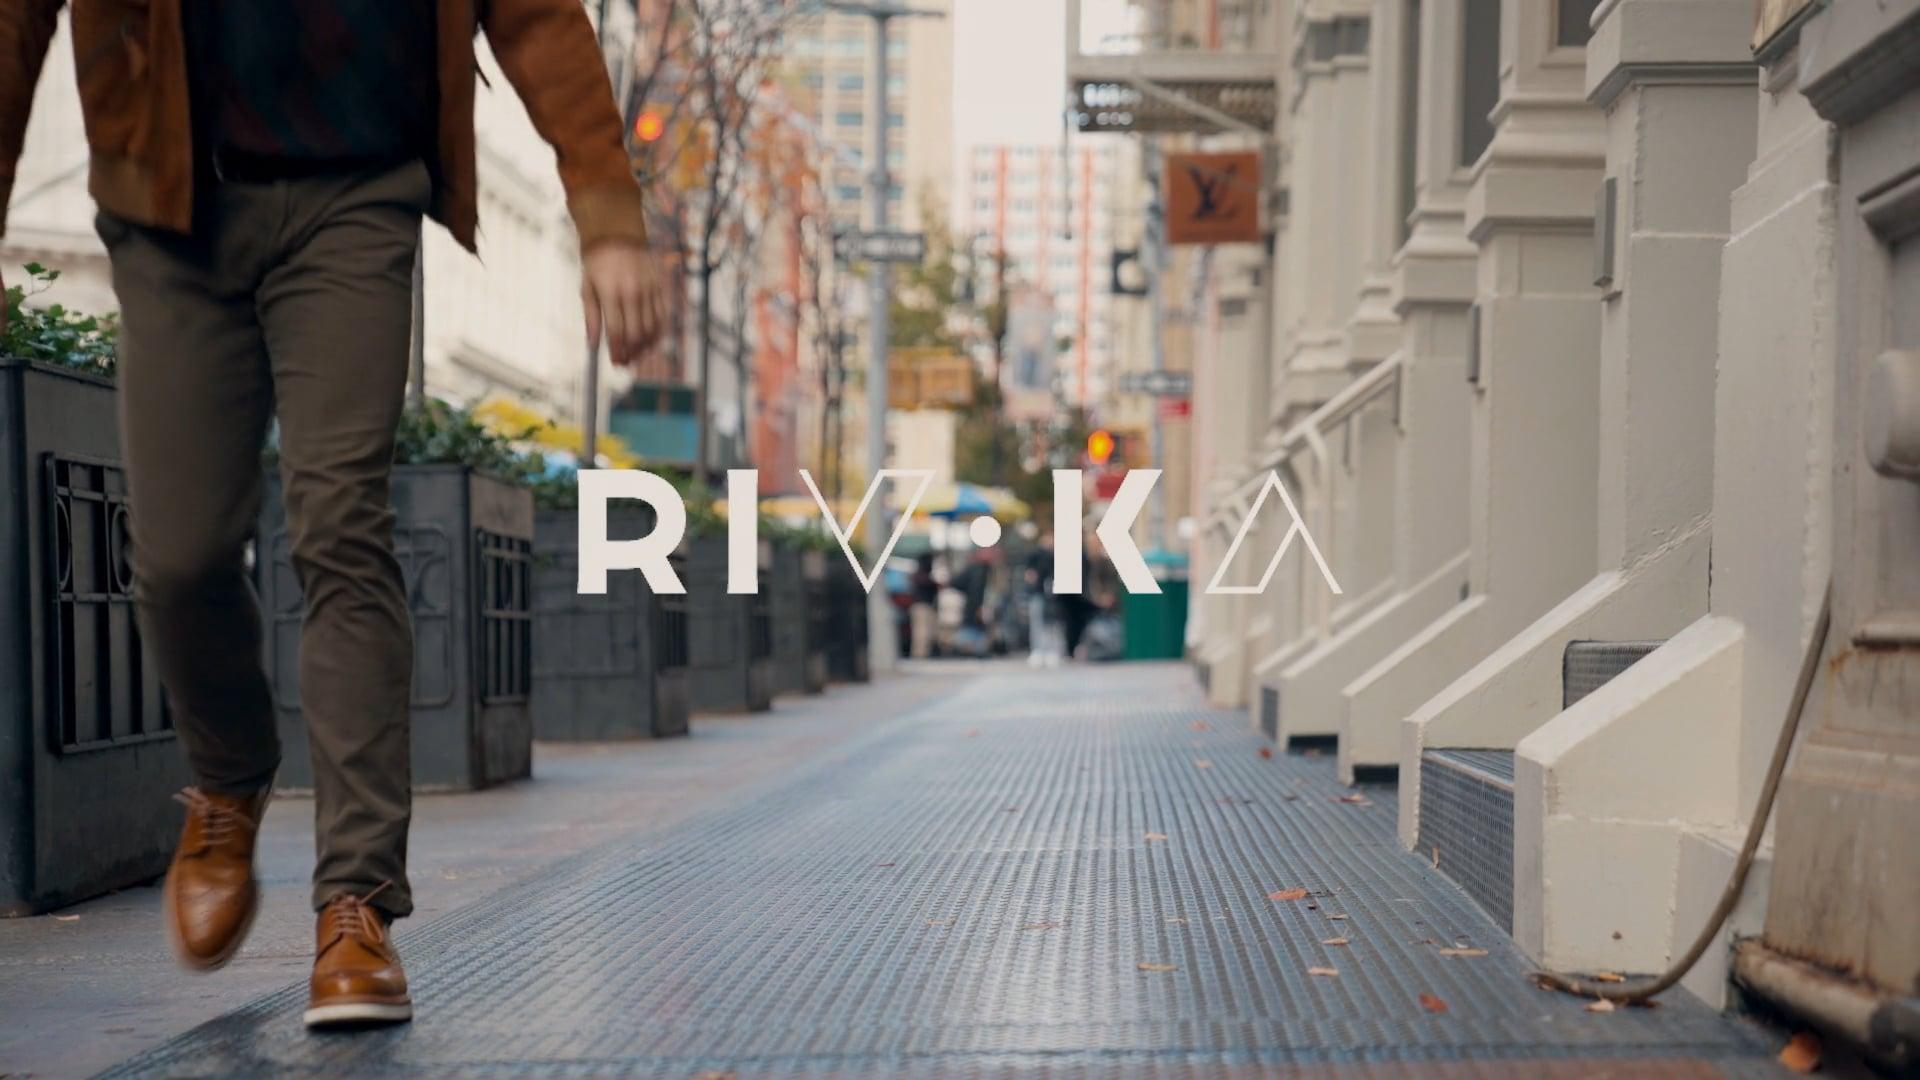 RIVKA Shoes Commercial - Part VII